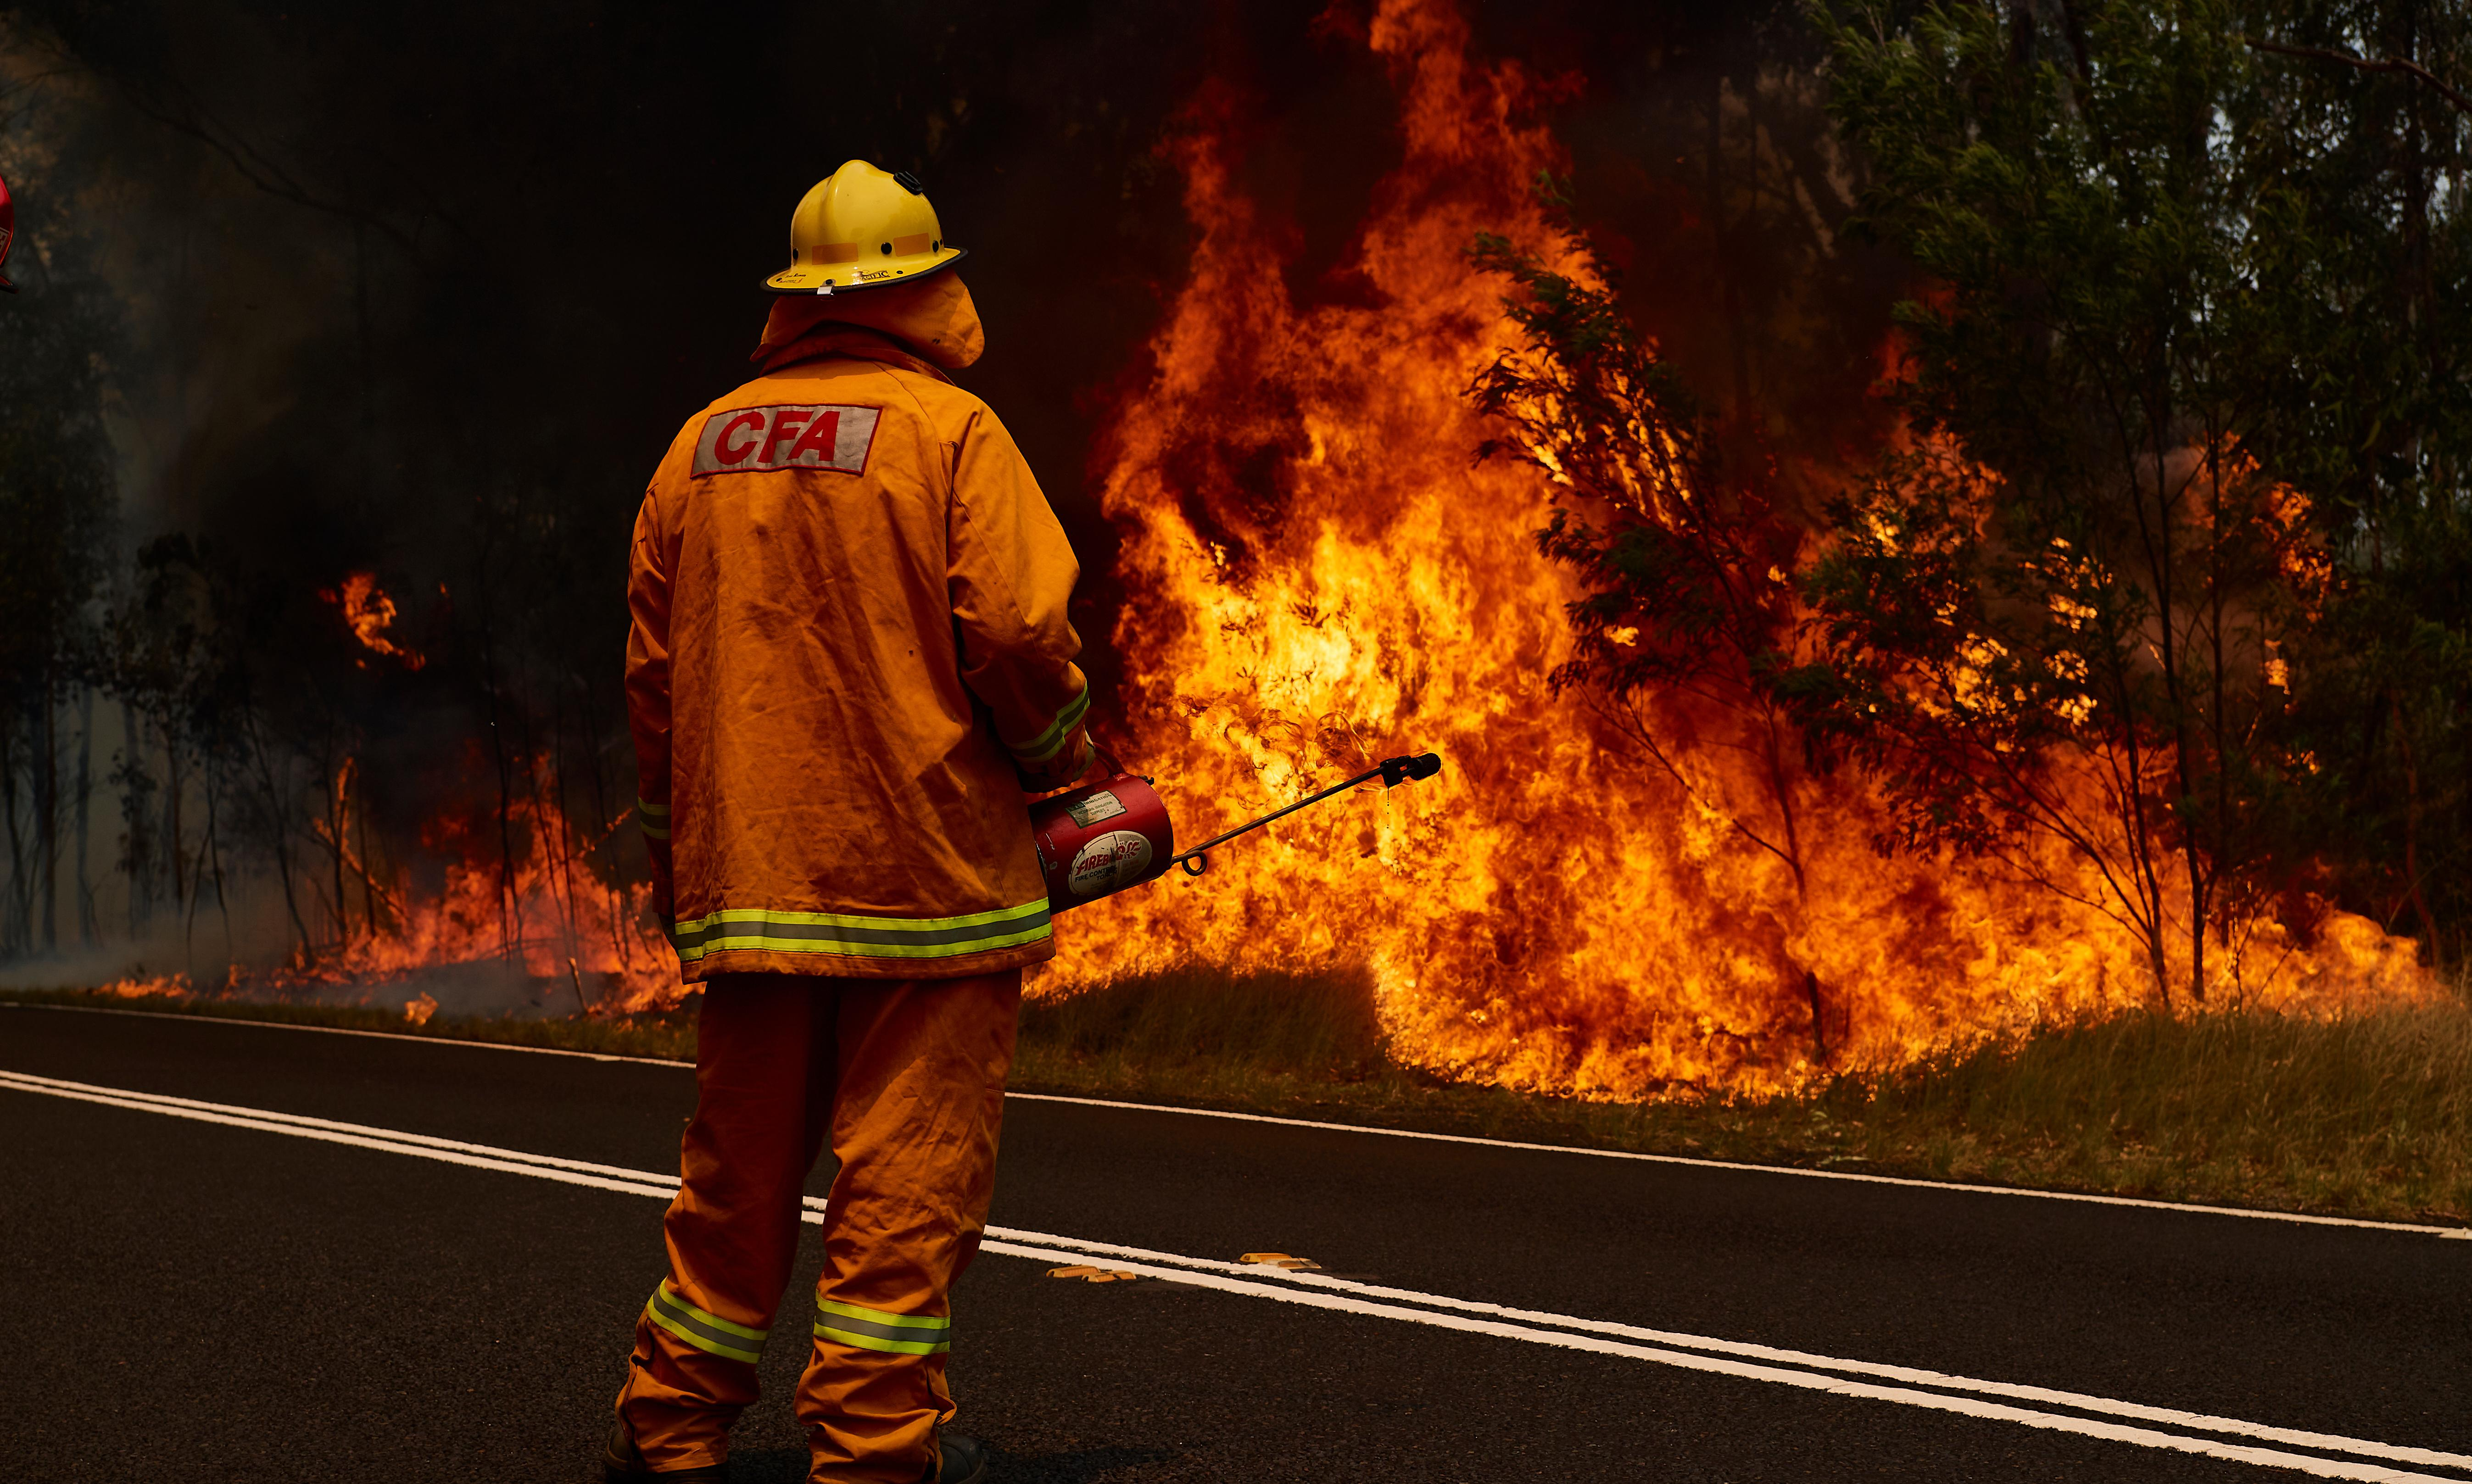 NSW and Qld fires: emergency bushfires warning for Hawkesbury on Sydney's fringe